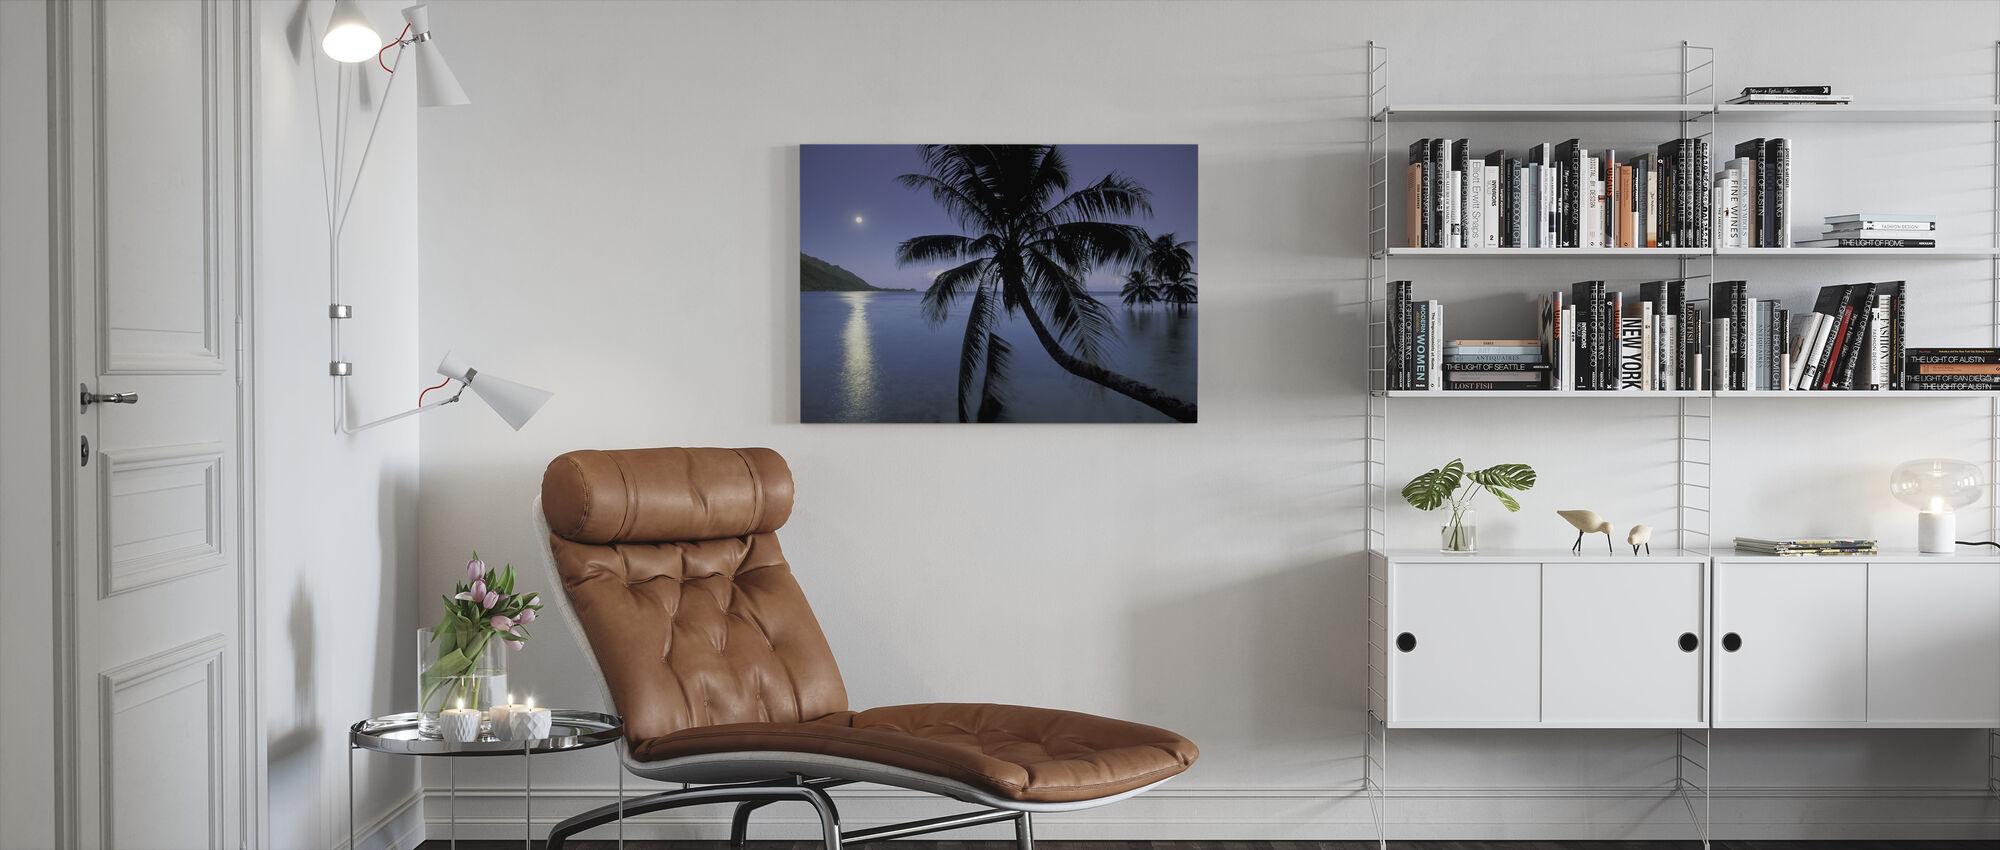 Dream Island - Canvastaulu - Olohuone